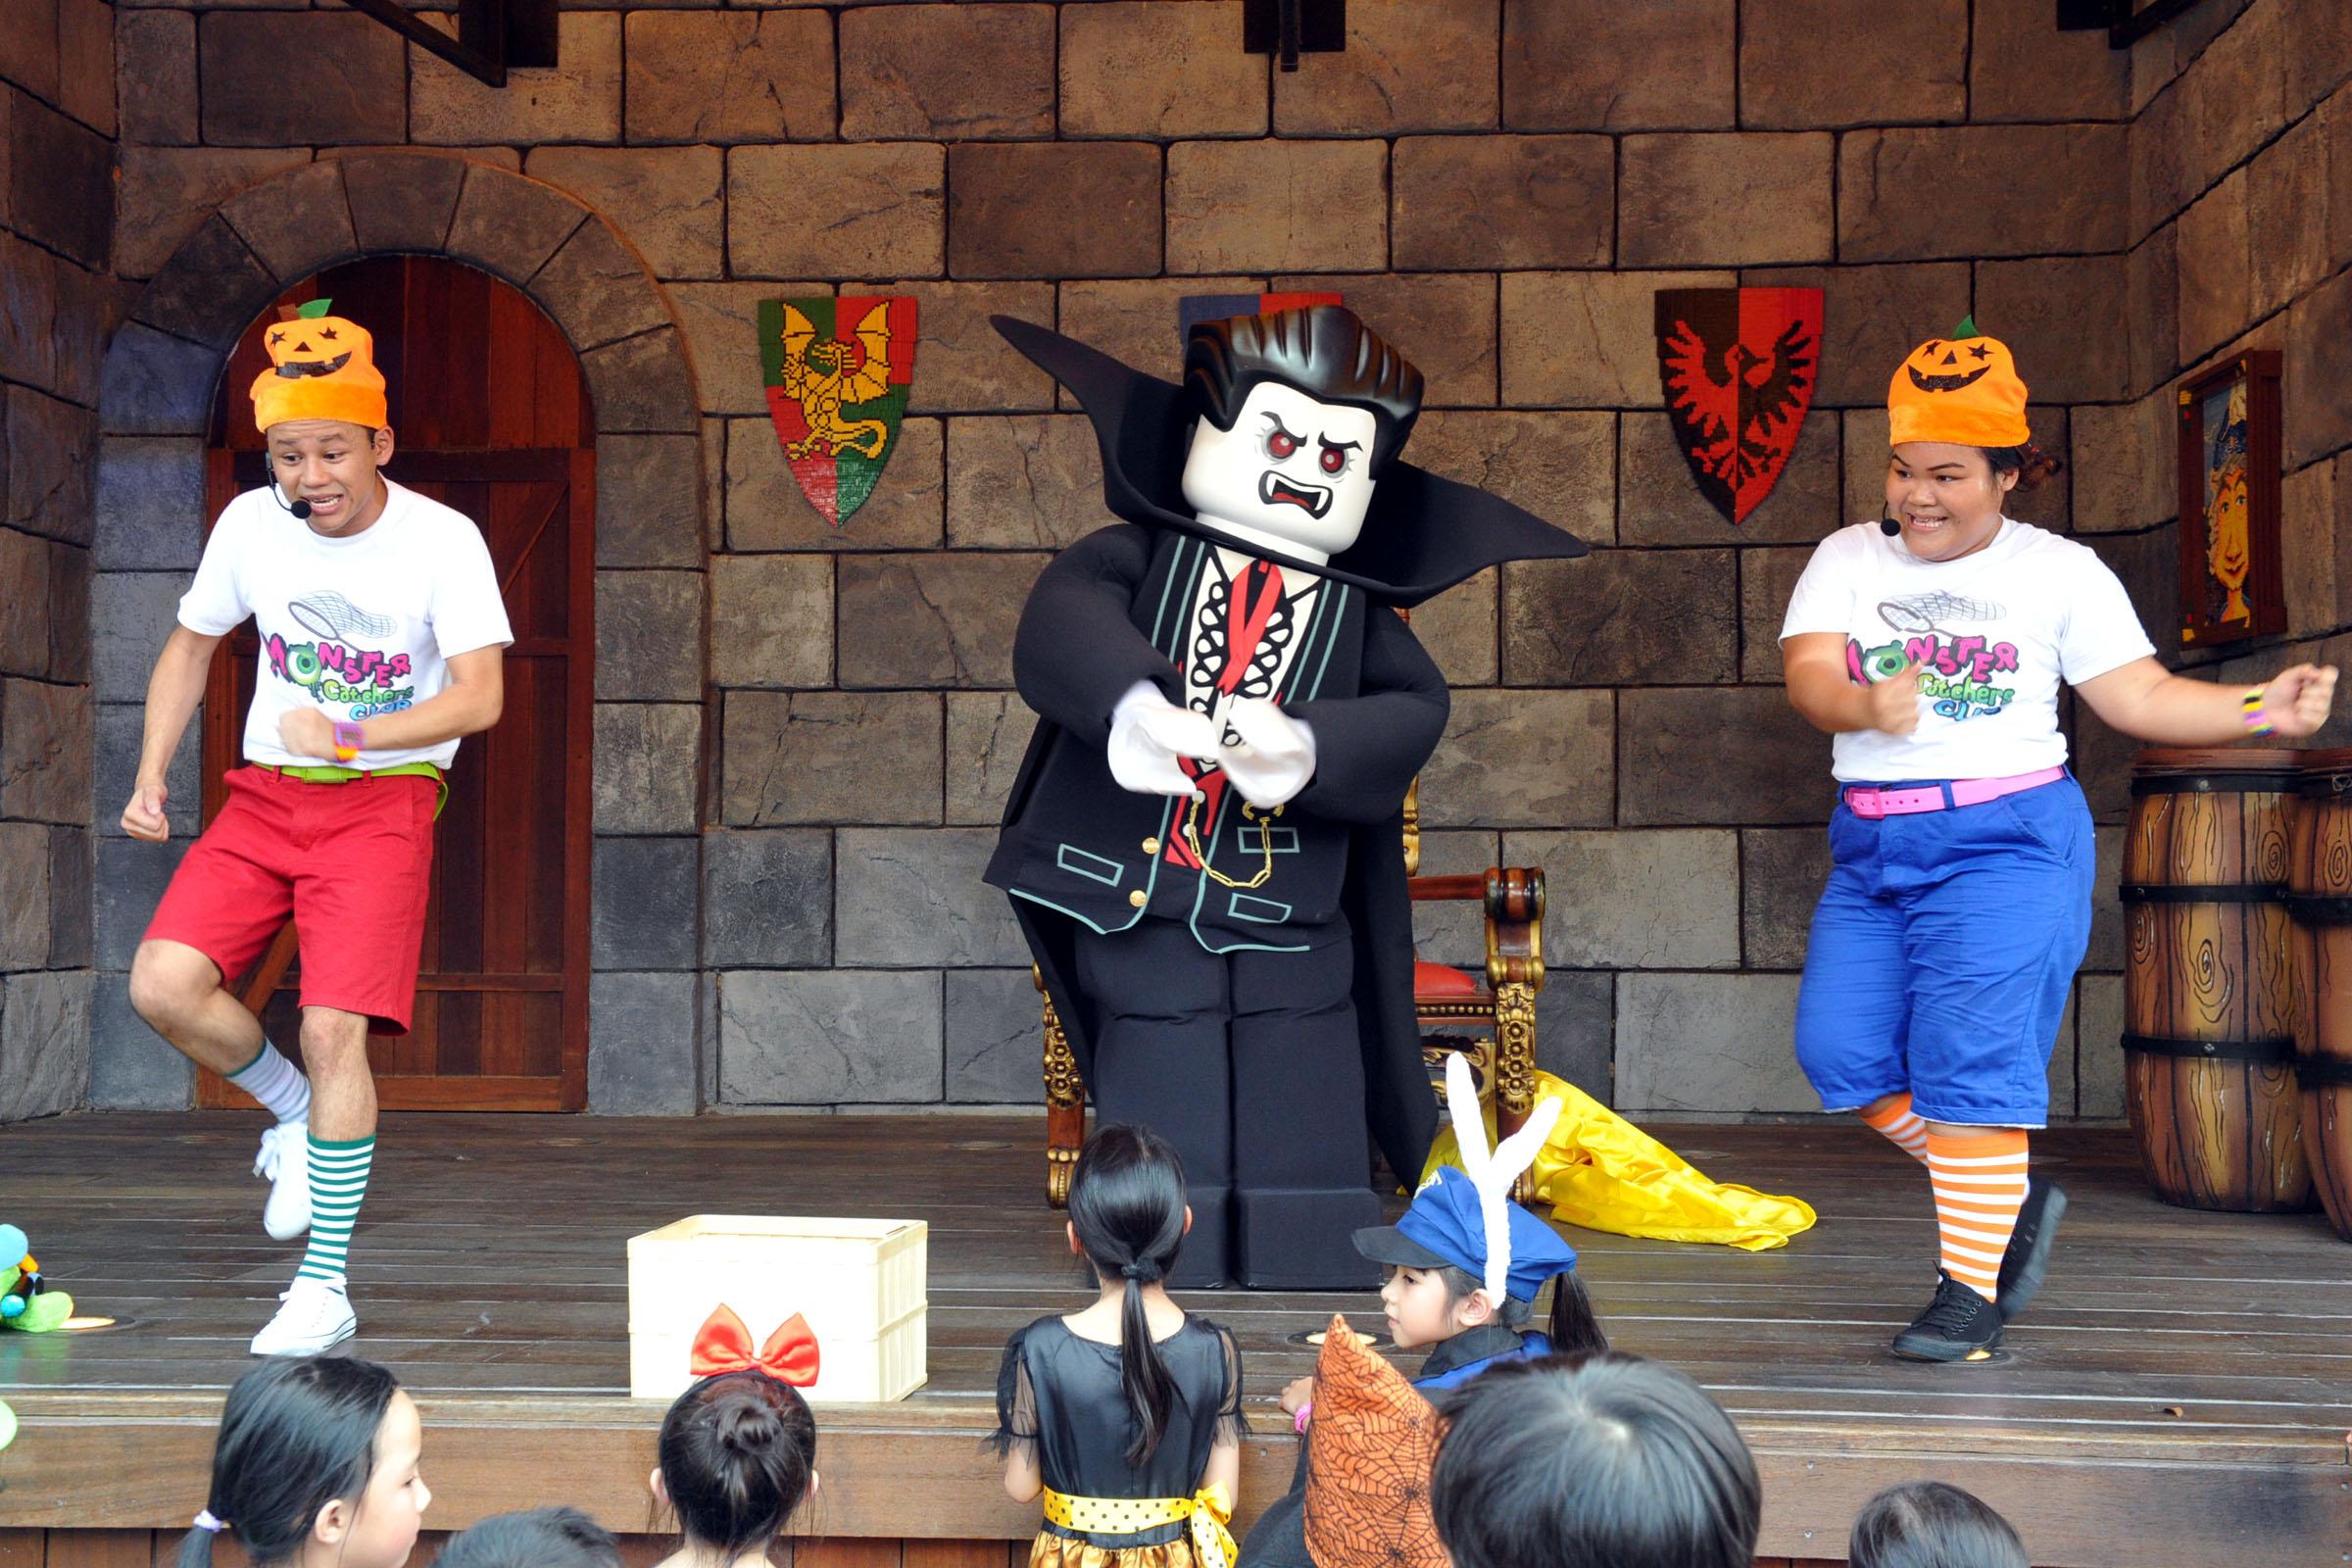 Picture Credit: Legoland Malaysia